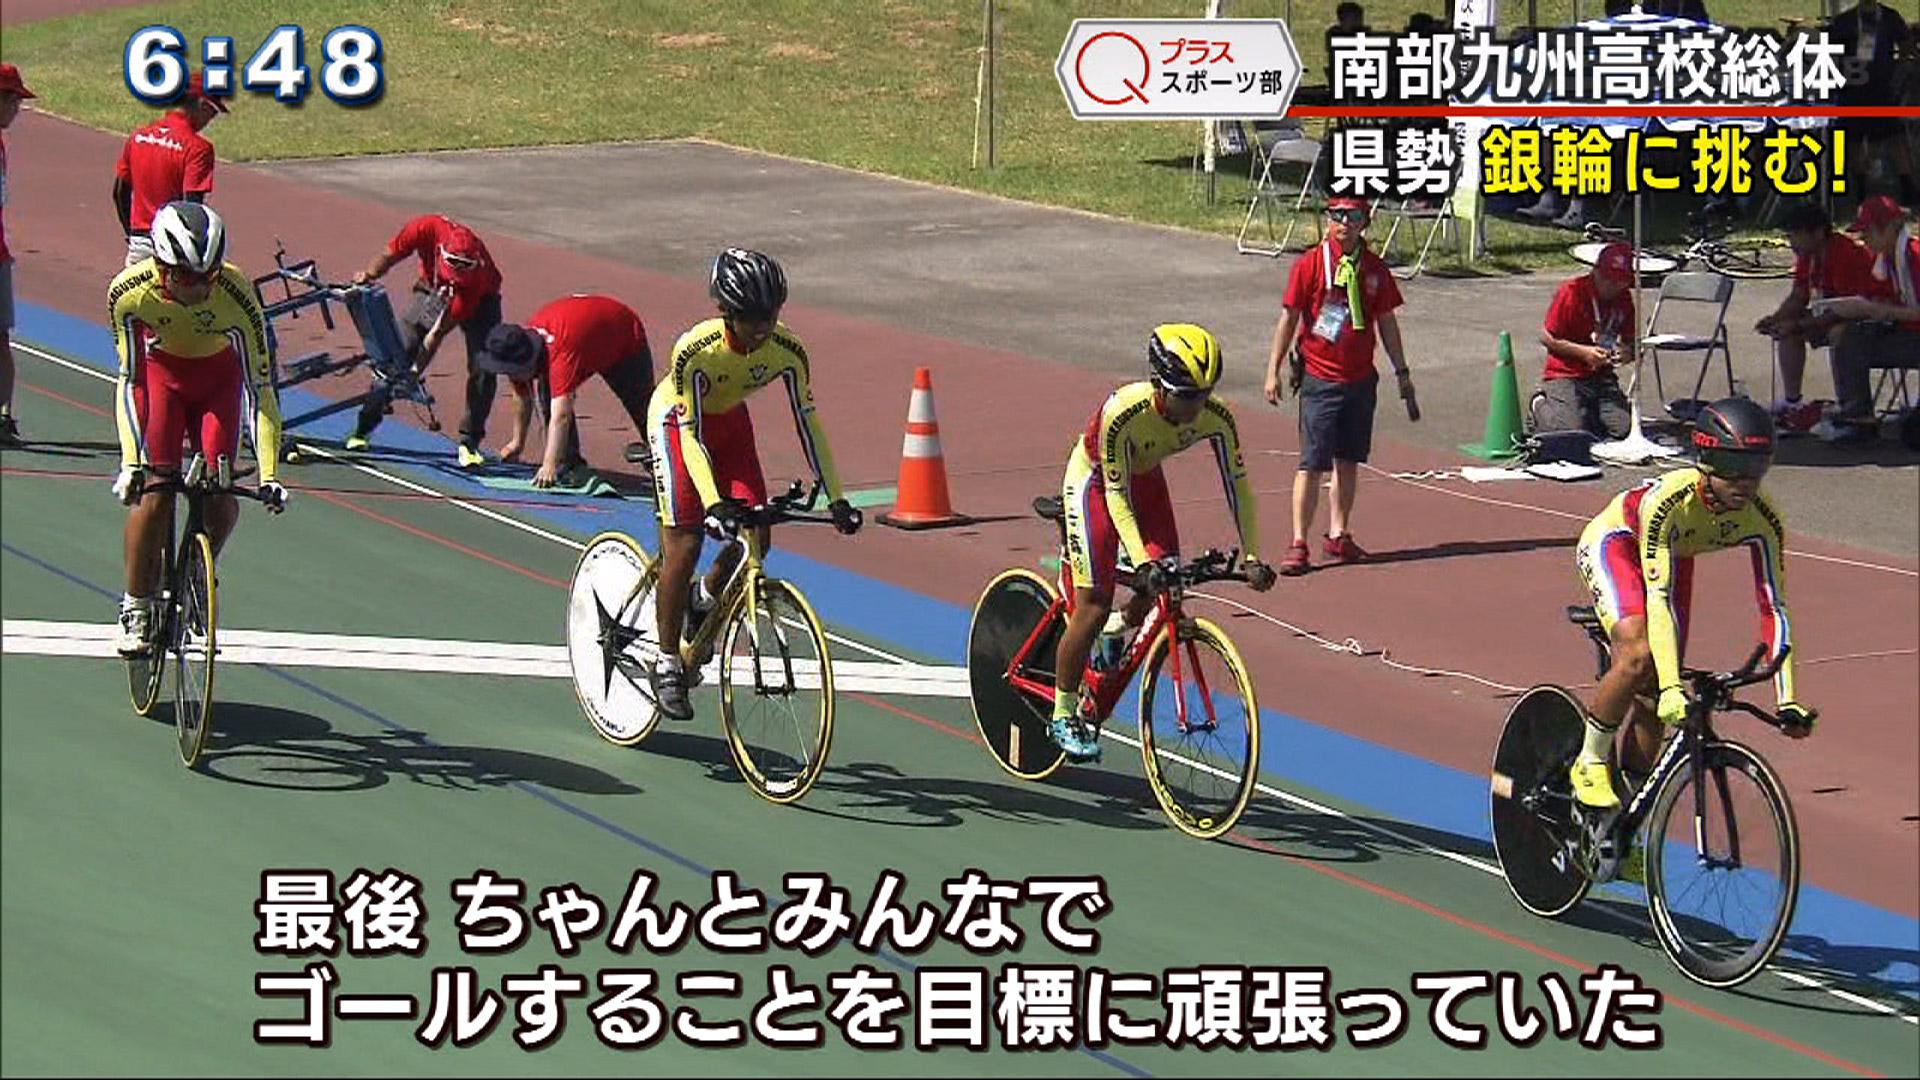 Qプラススポーツ部 ばんみかせ!南部九州総体 自転車競技 銀輪に挑む!